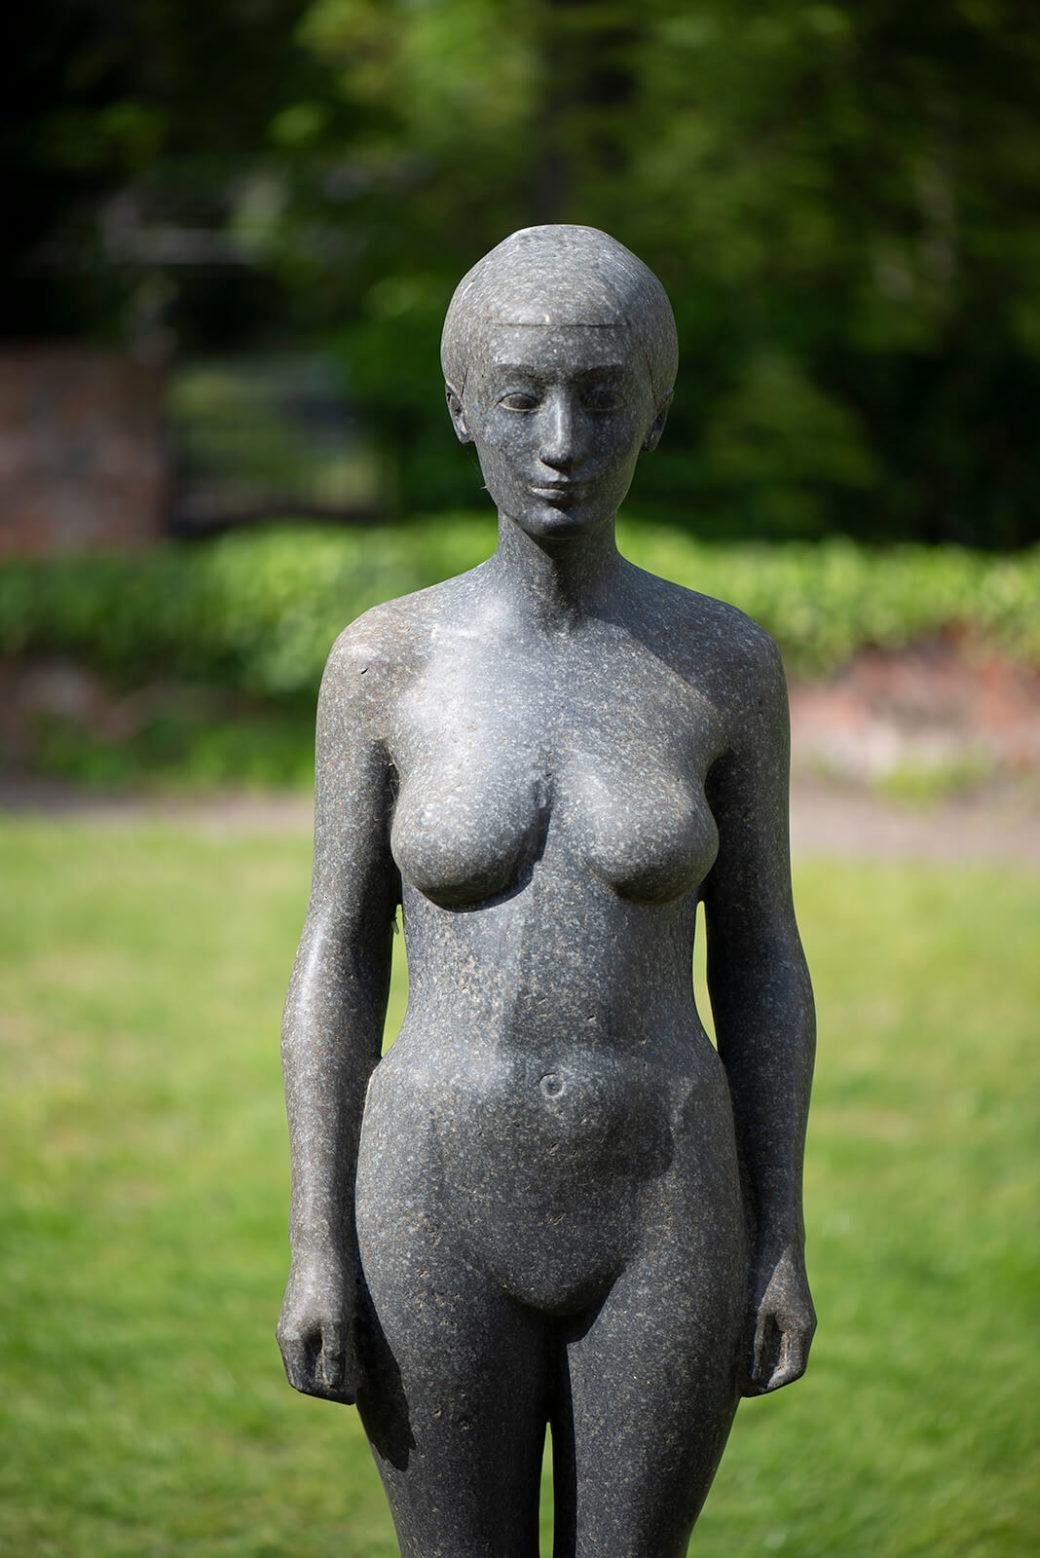 Klaus Kütemeier: Stehende weibliche Figur (Foto: KUNST@SH/Jan Petersen, 2019)